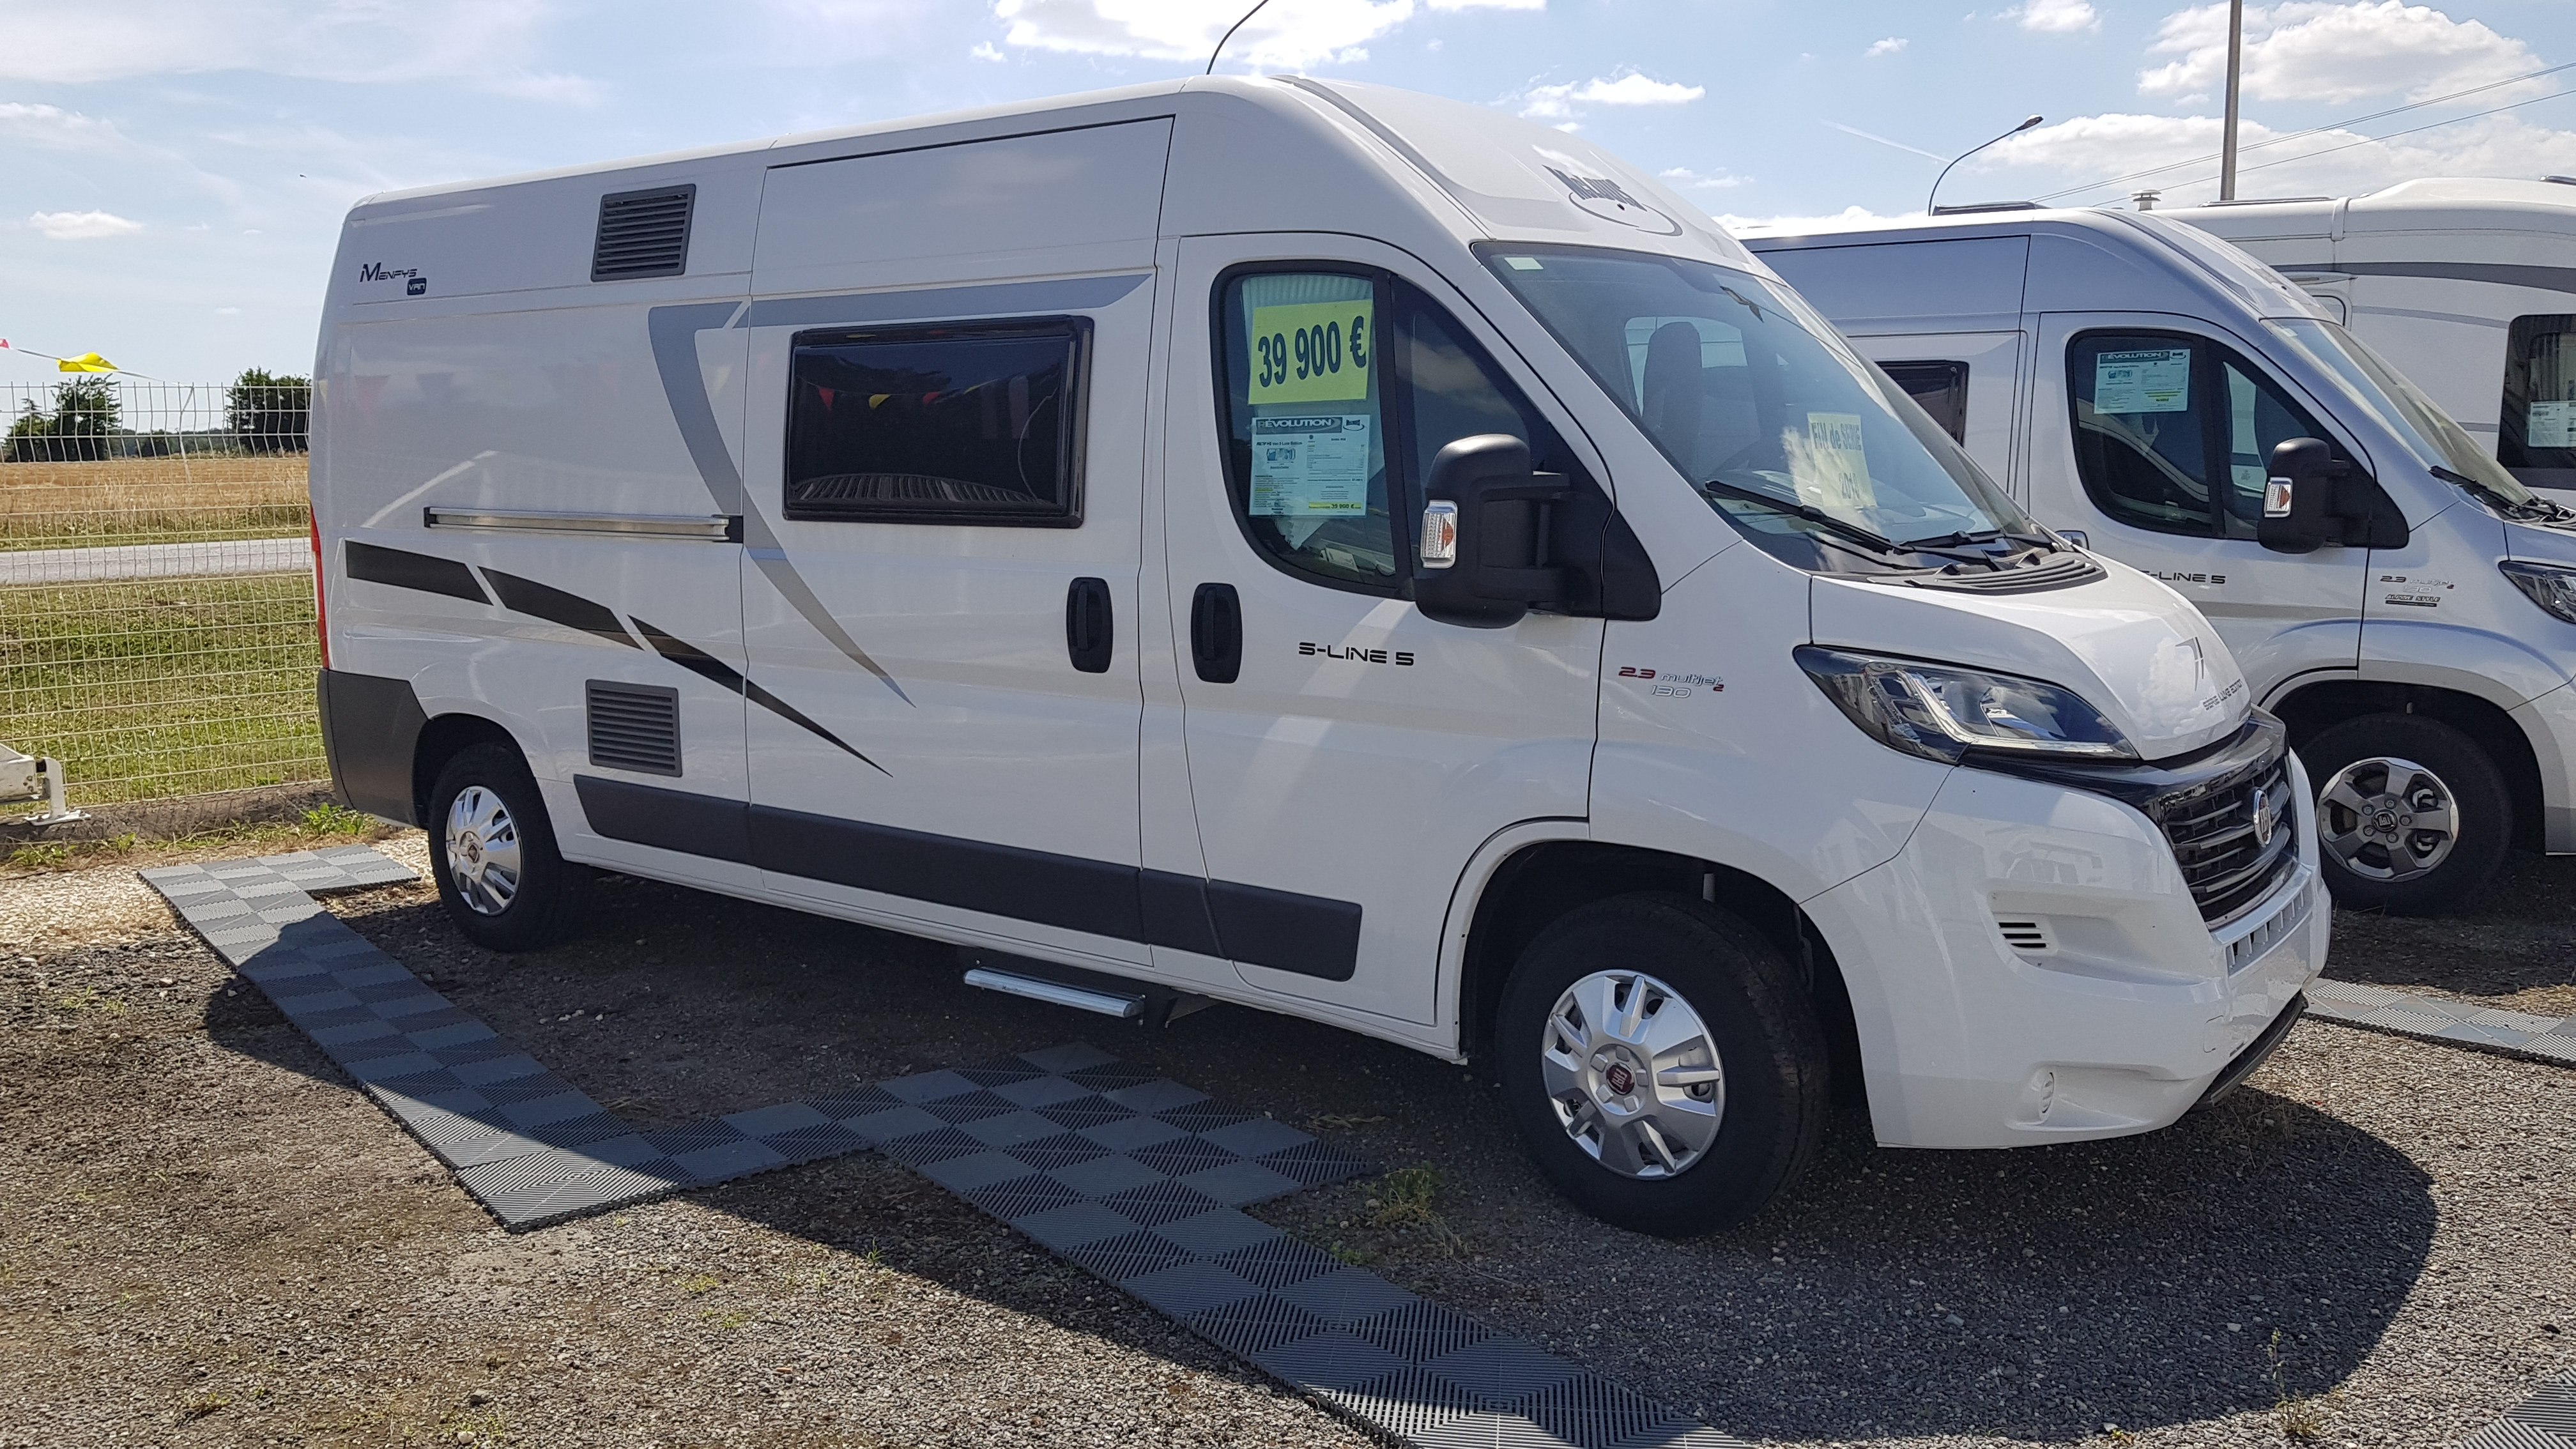 mc louis menfys van 5 s line luxe neuf de 2018 fiat camping car en vente ruffec charente. Black Bedroom Furniture Sets. Home Design Ideas